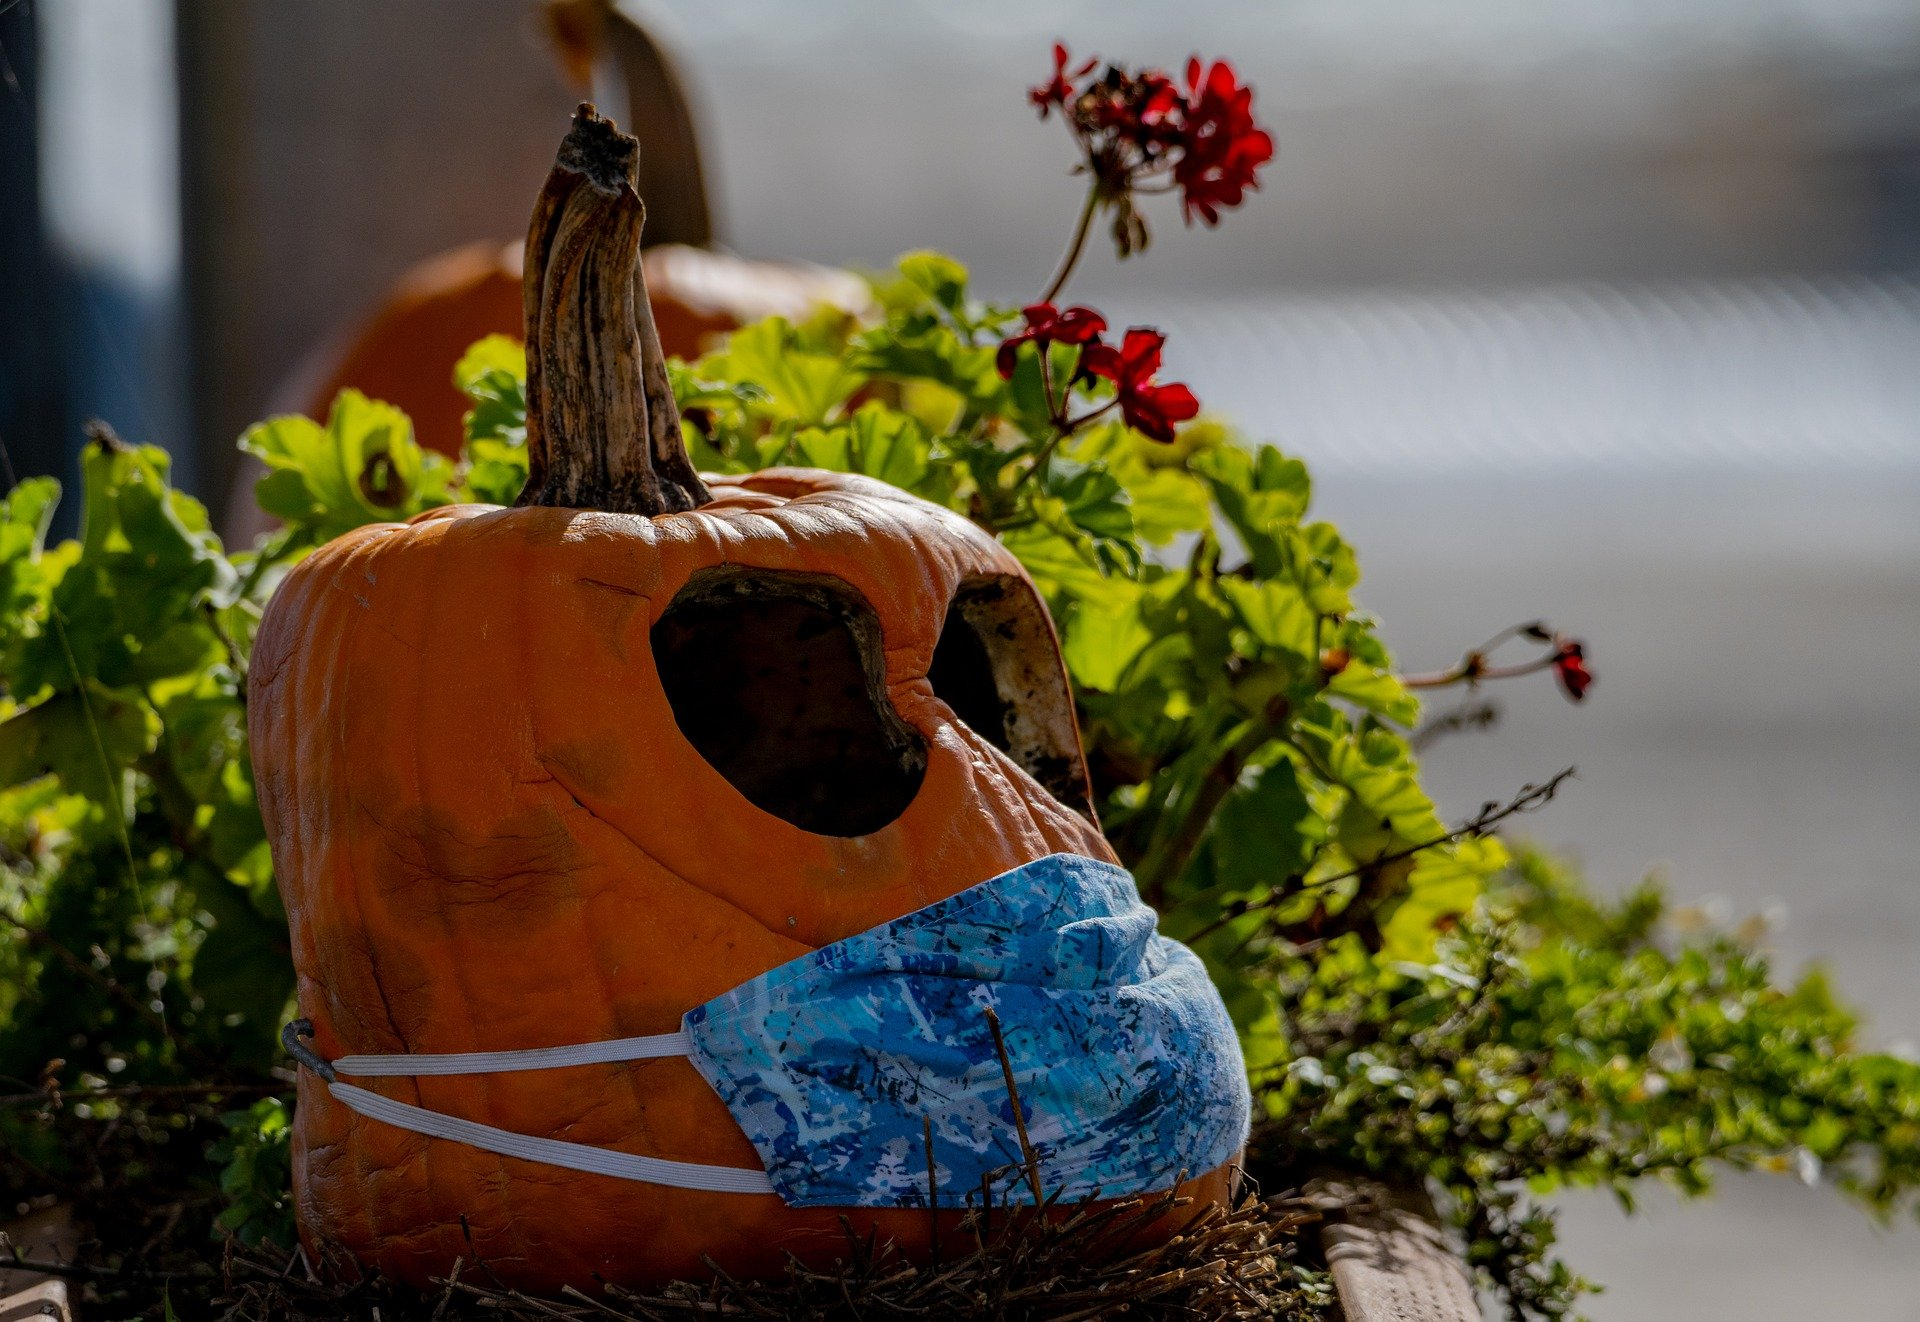 Halloween 2020, truco o trato: solo se podrán regalar mascarillas, geles hidroalcohólicos y listerine